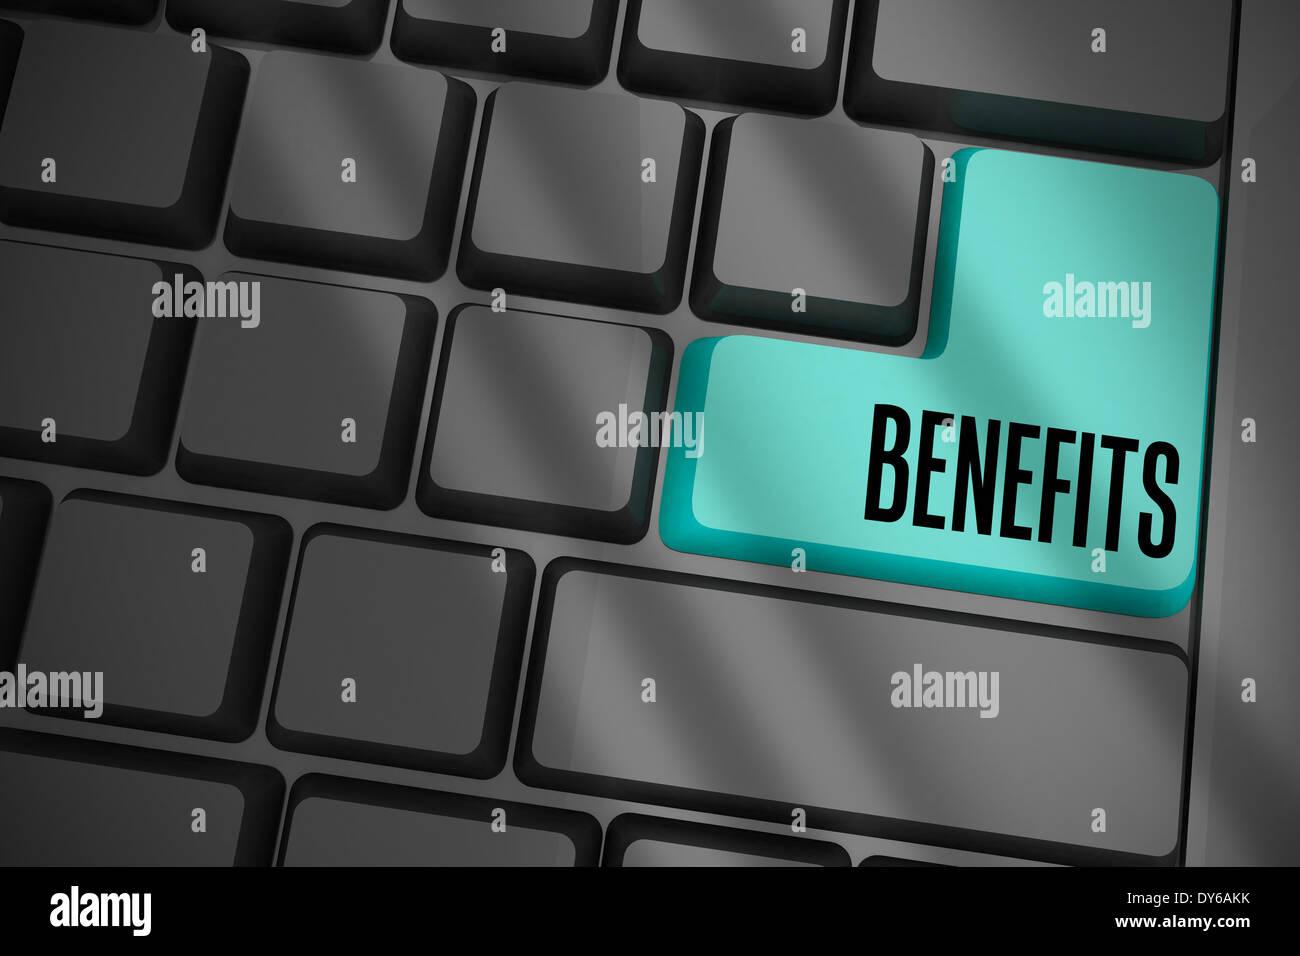 Benefits on black keyboard with blue key - Stock Image